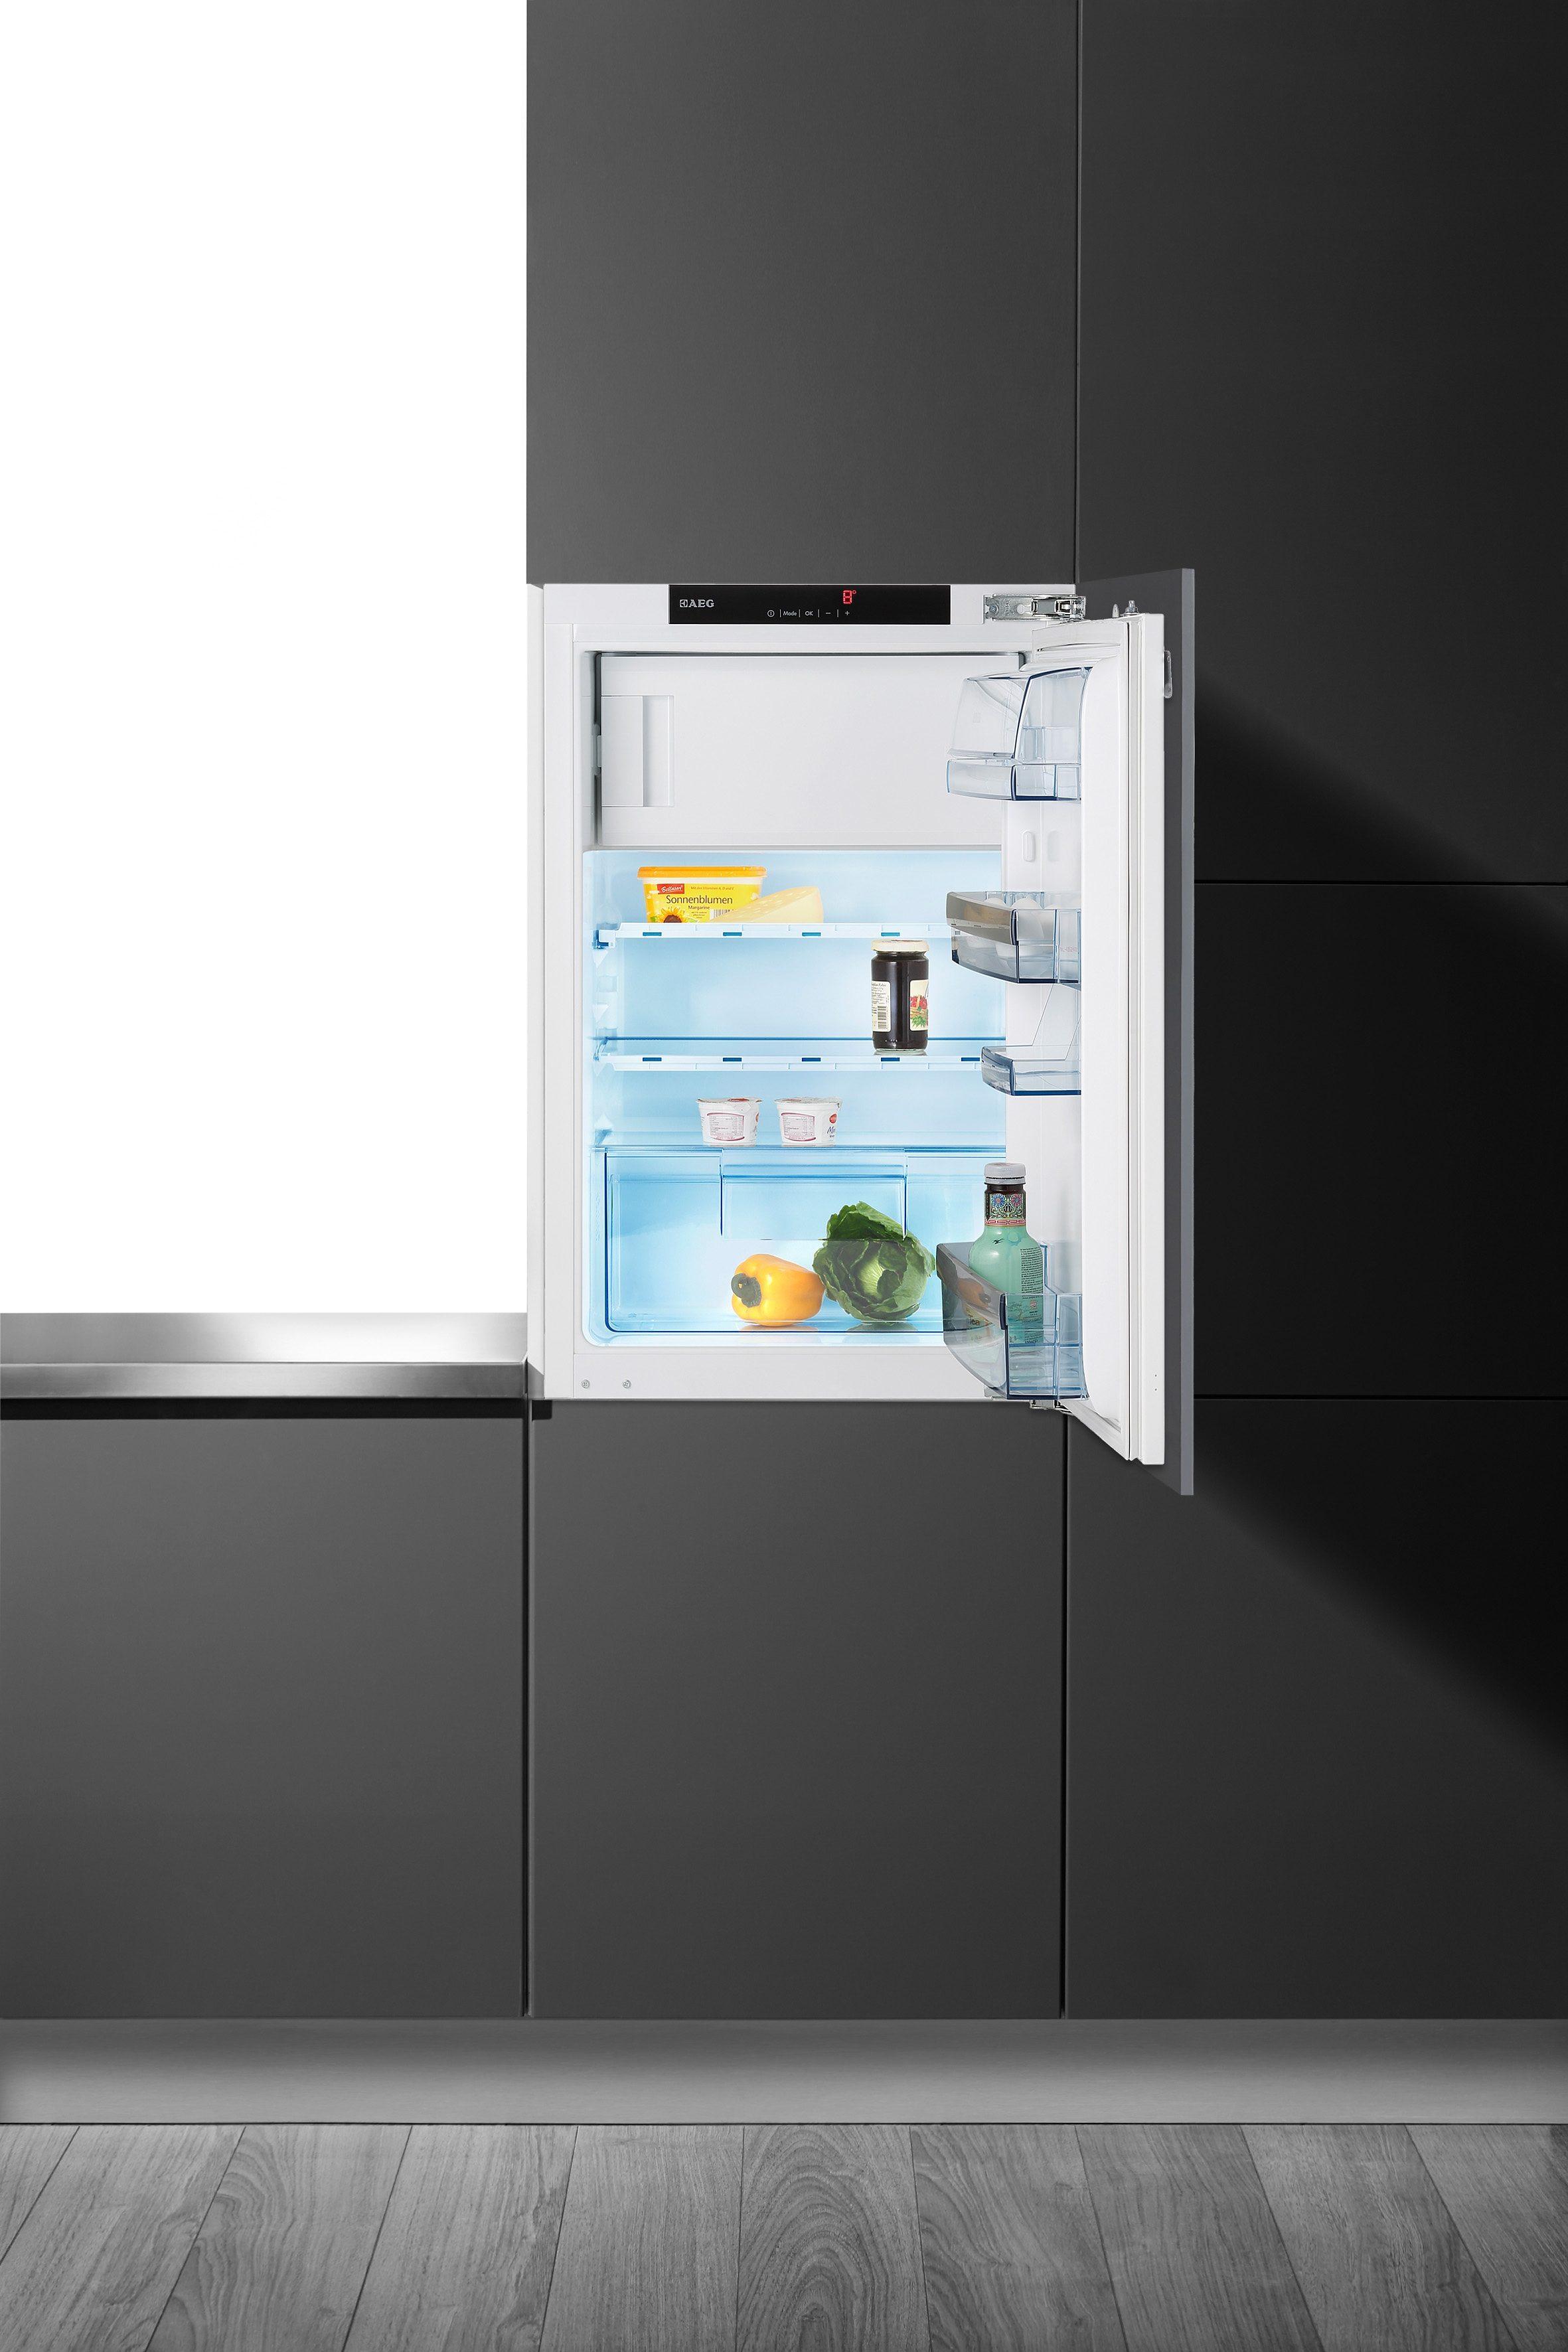 AEG Einbaukühlschrank SANTO SKS98840C4, A+++, 87 cm hoch